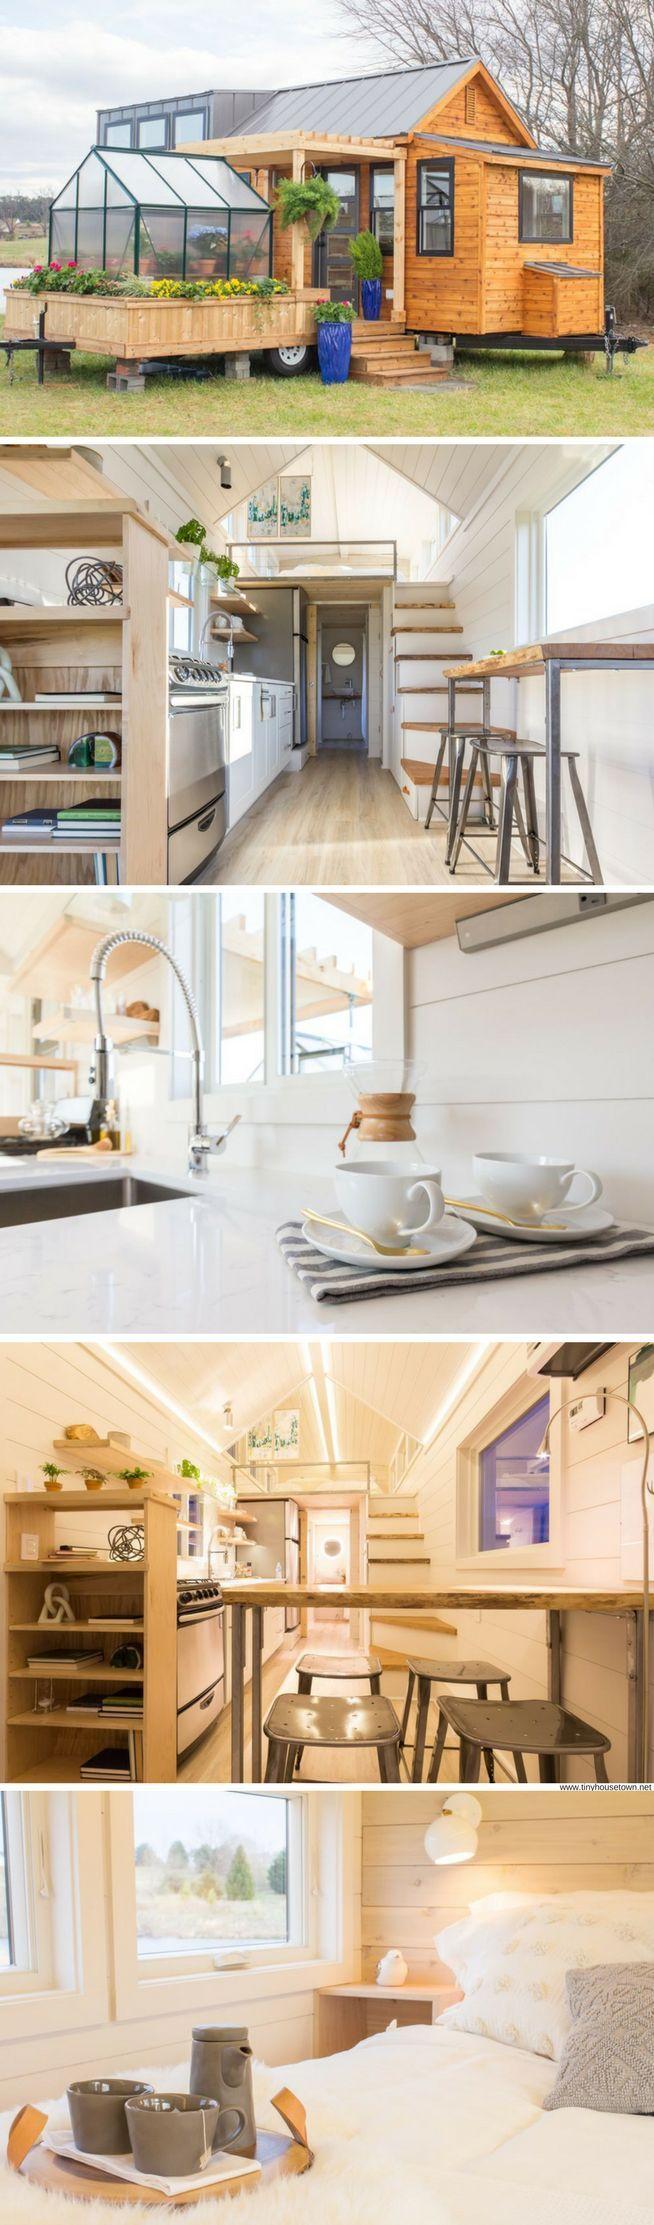 9 Top Living Room Lighting Ideas